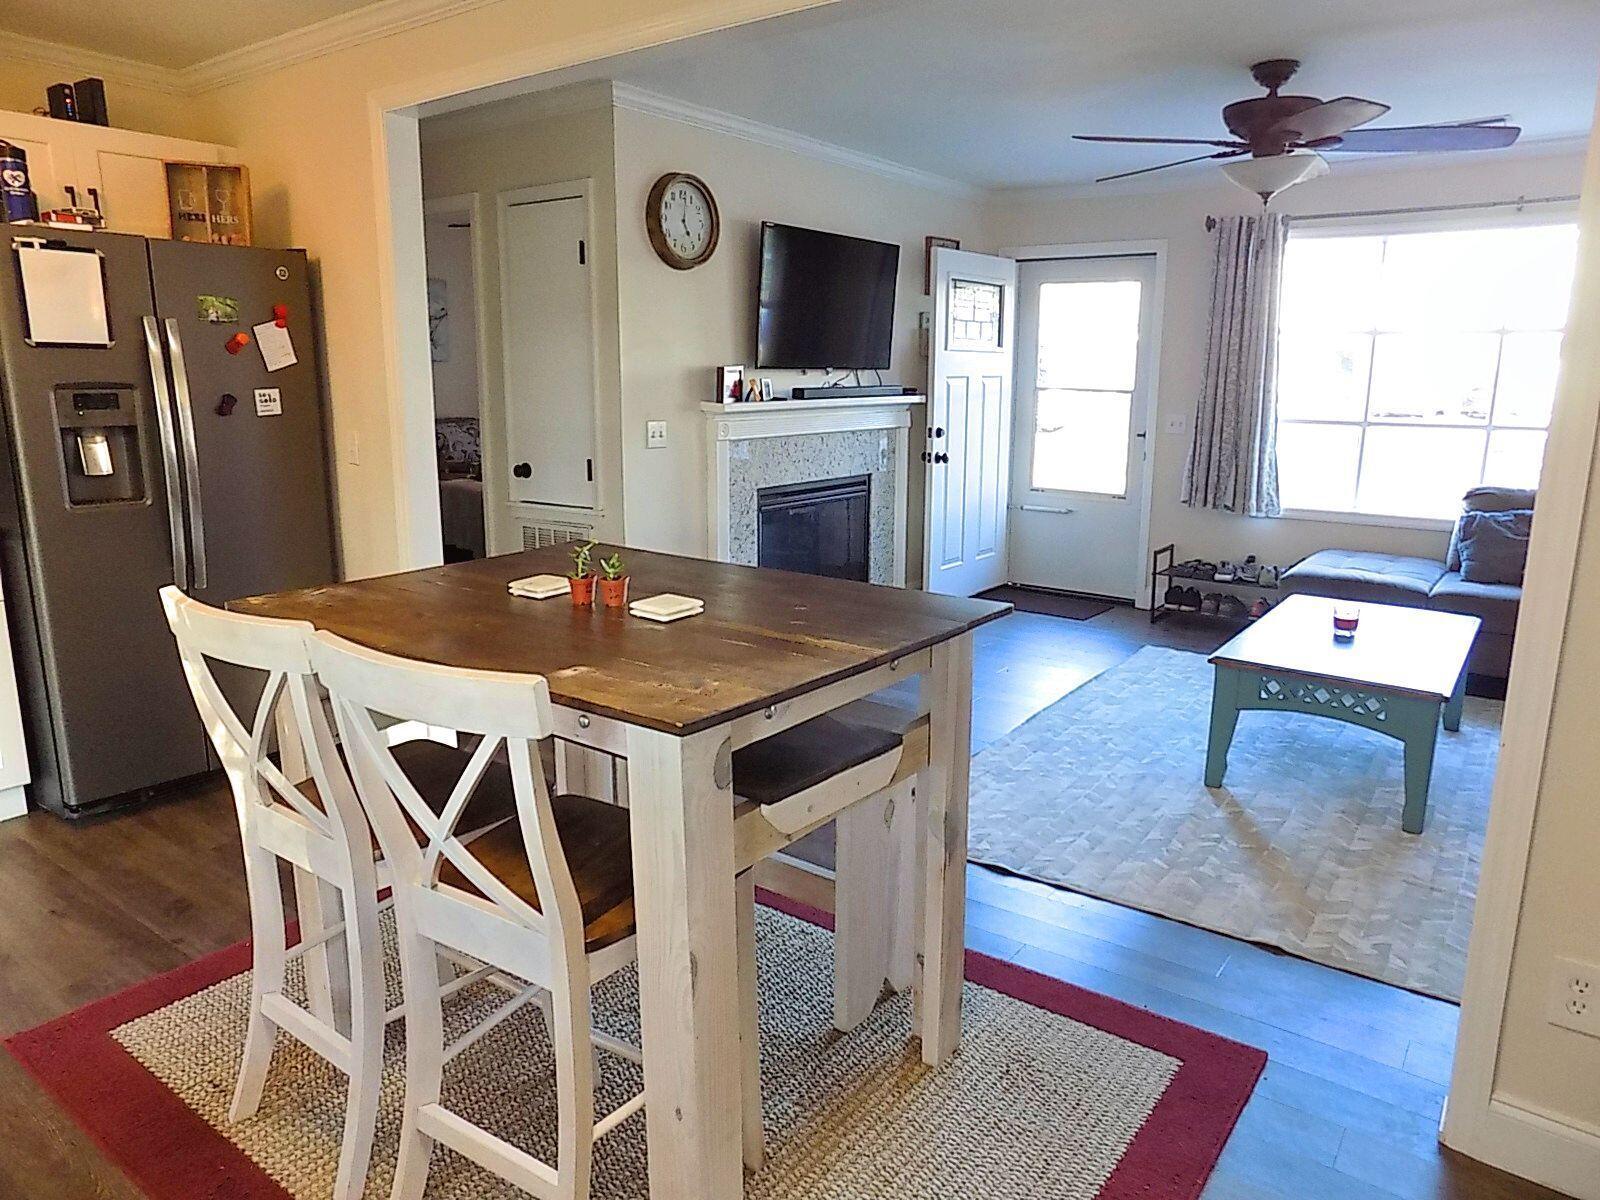 West Ashley Plantation Homes For Sale - 1720 Boone Hall, Charleston, SC - 14